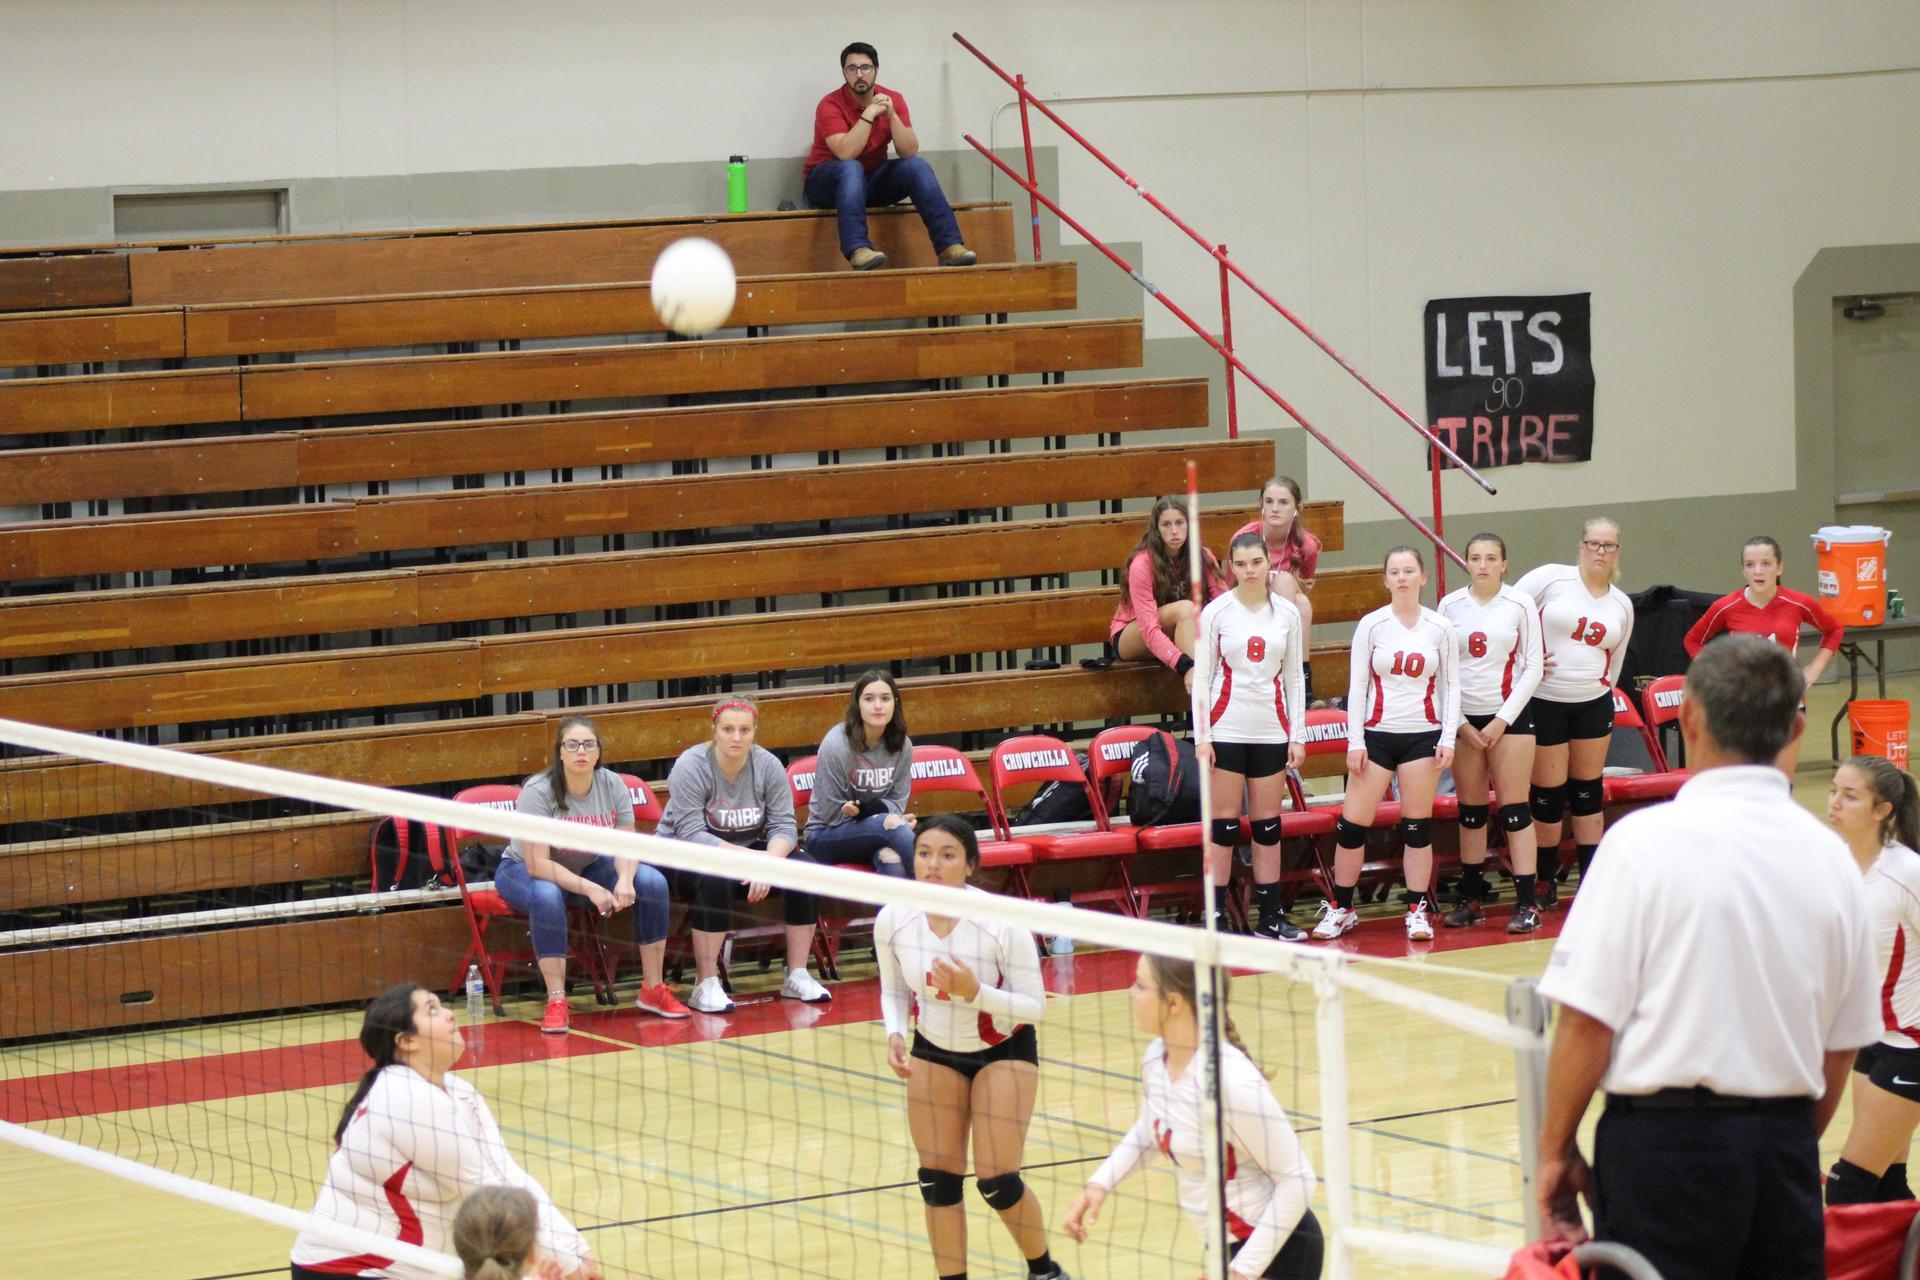 JV Girls playing volleyball against Yosemite